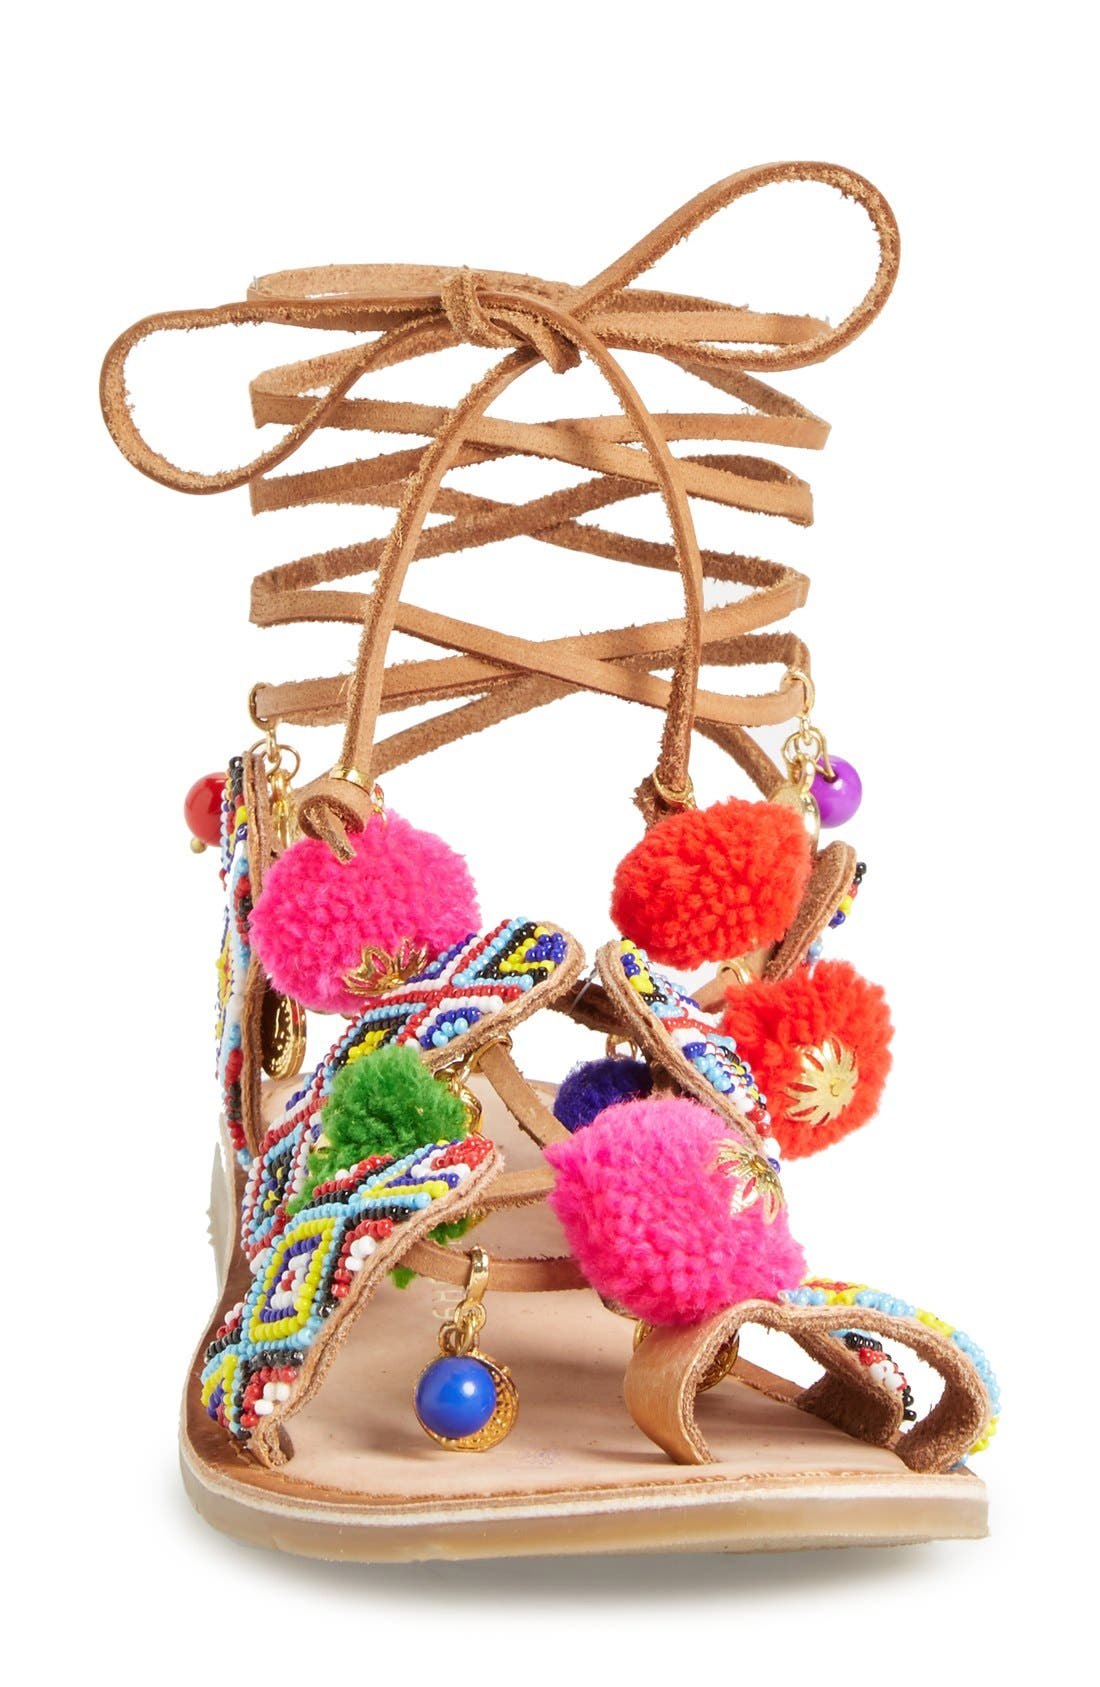 CHINESE LAUNDRY, 'Posh' Embellished Lace-Up Sandal, Alternate thumbnail 3, color, 218